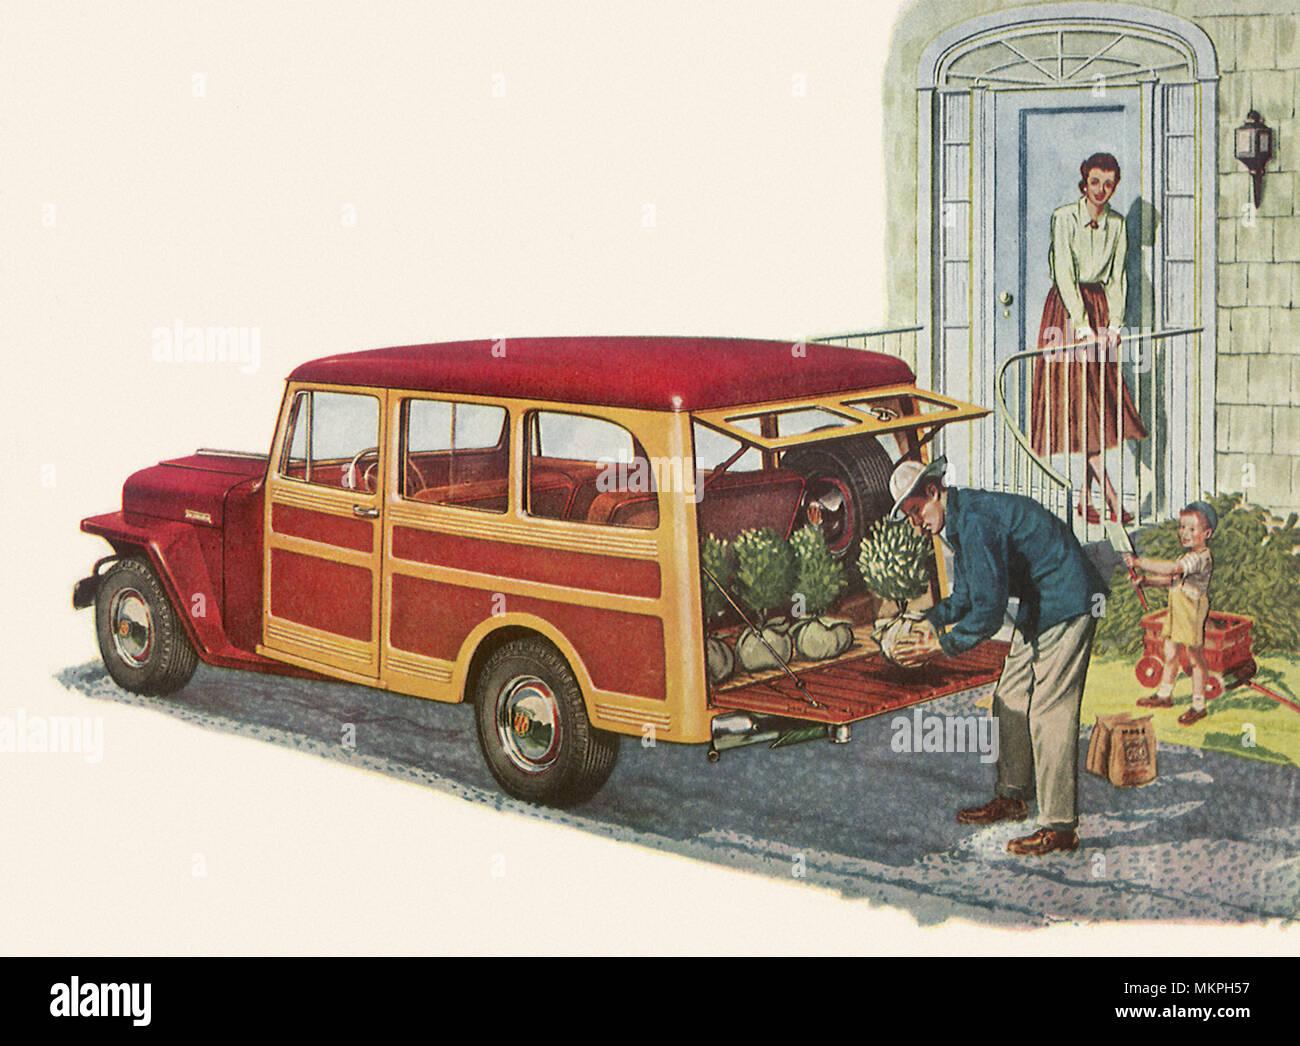 1949 Willys Overland Jeep Station Wagon Stock Photo 184278563 Alamy 1950